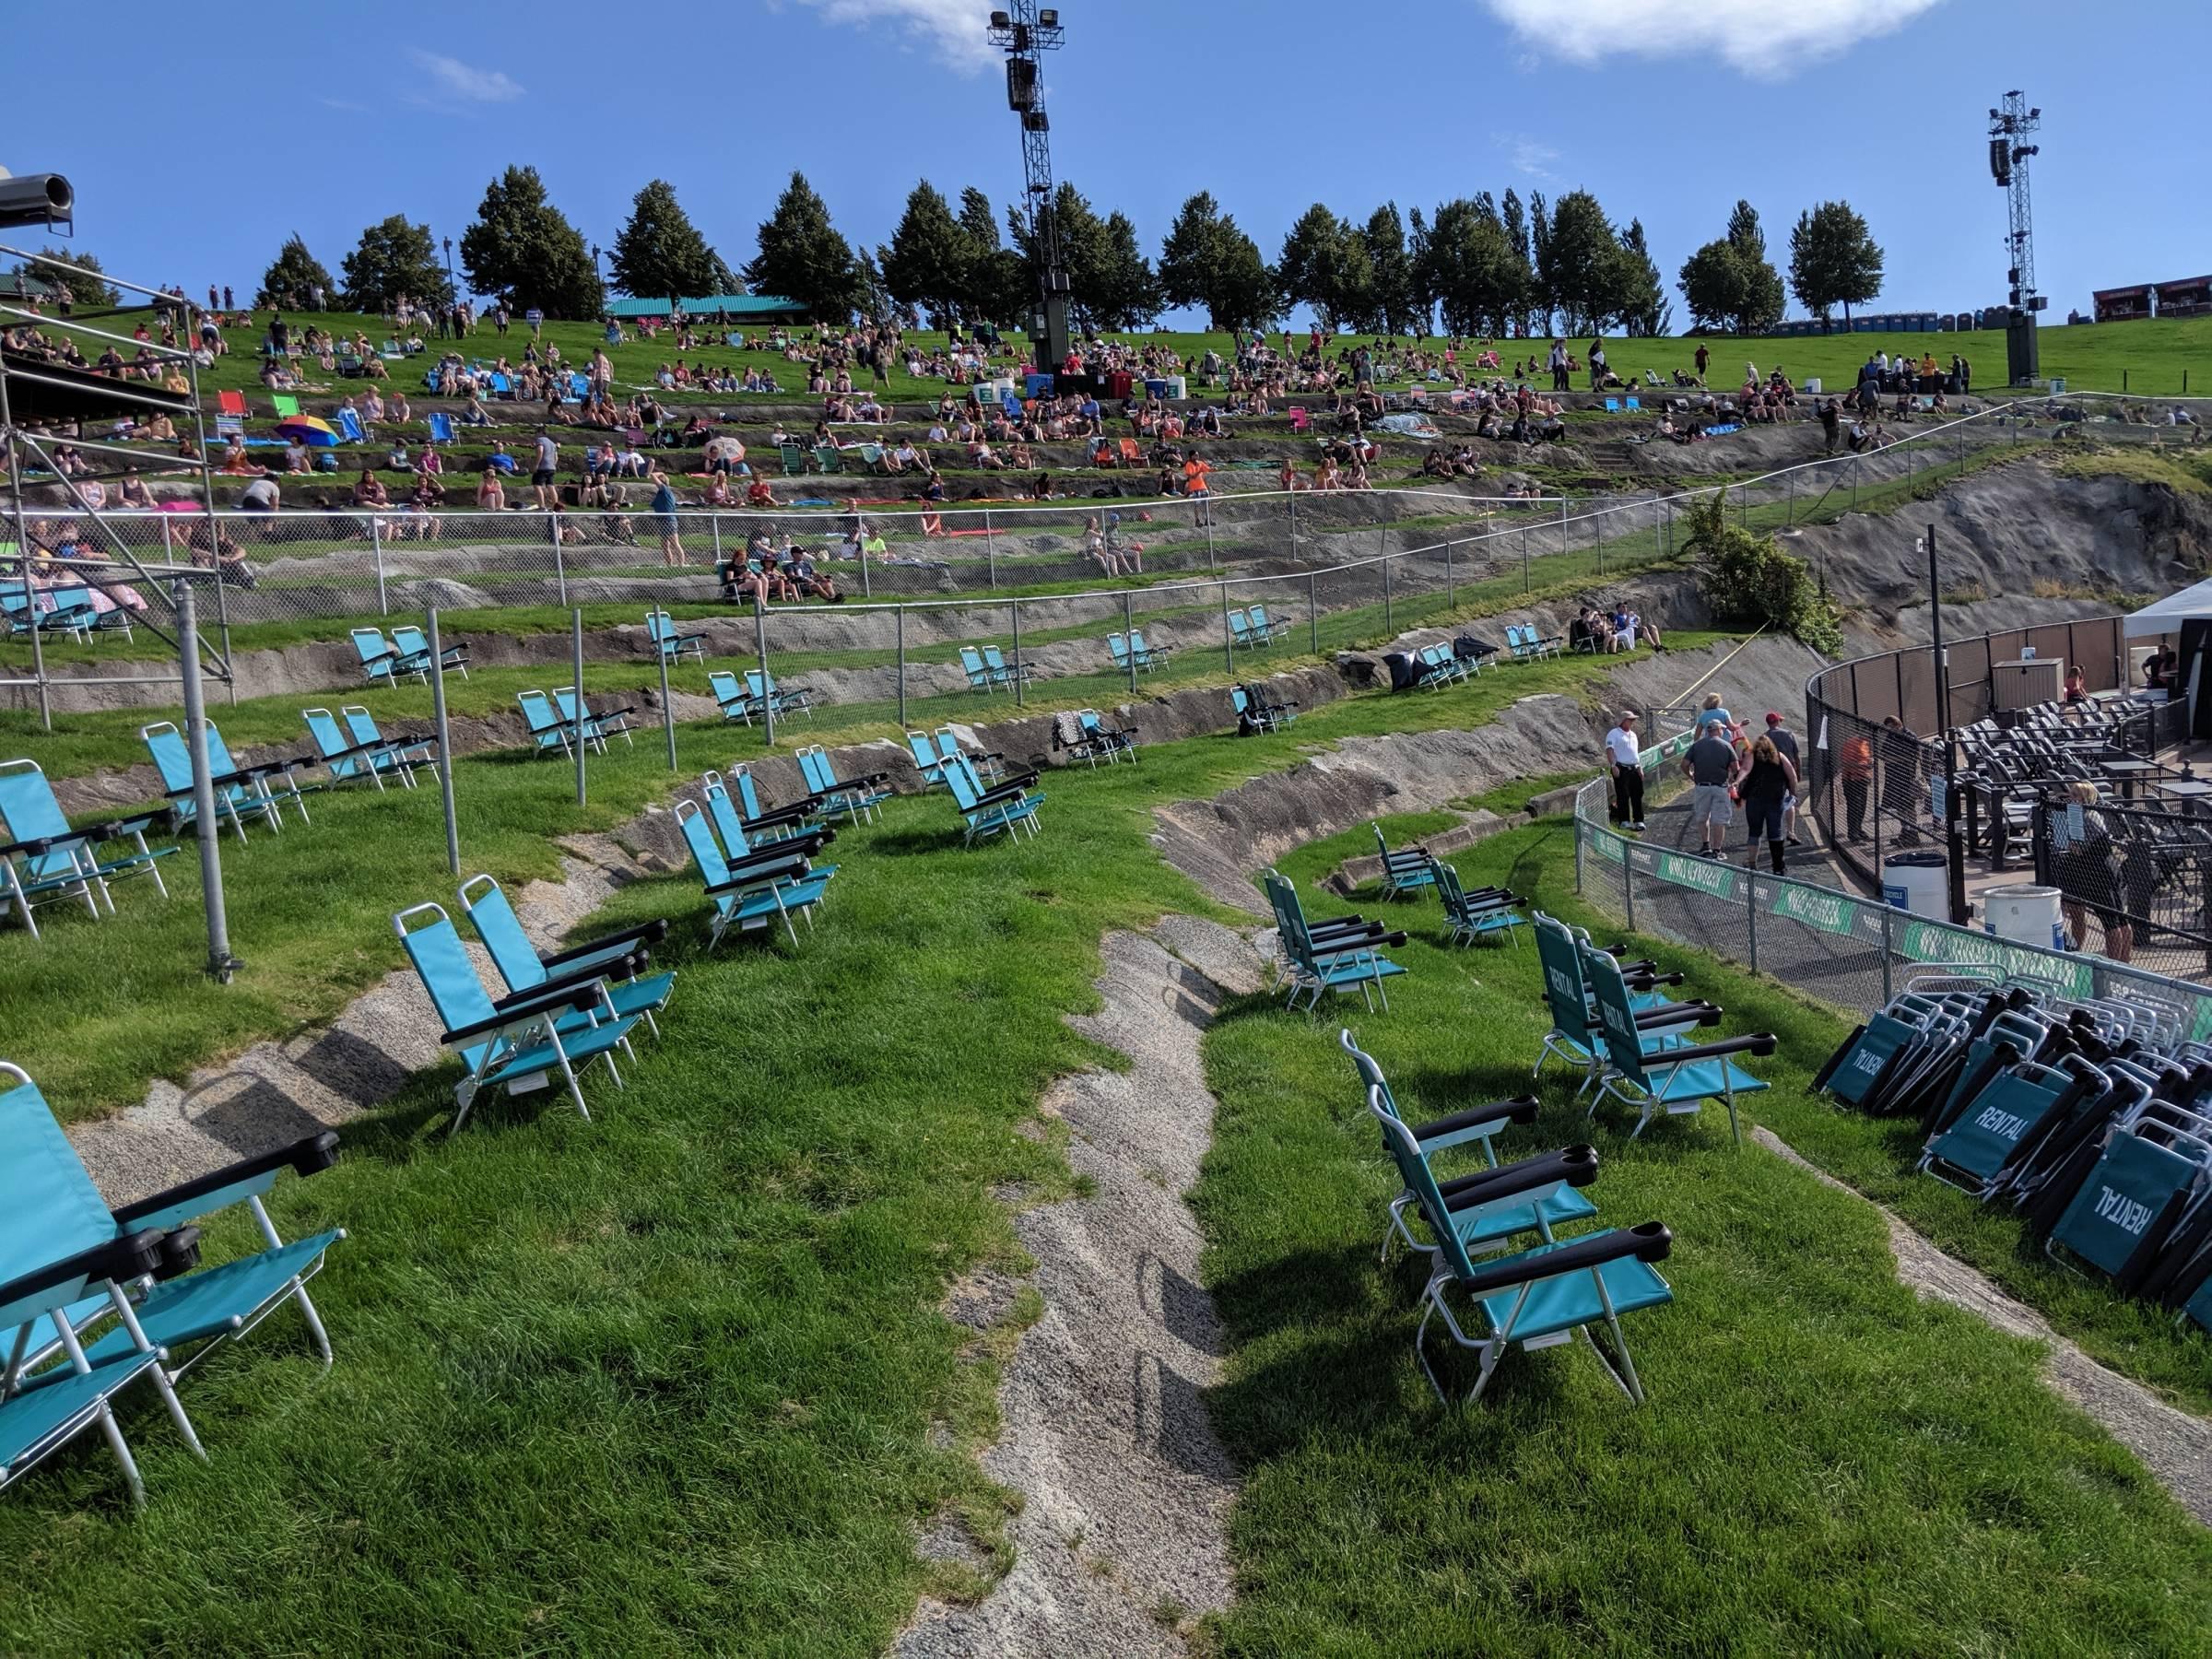 Gorge Amphitheatre Seating Guide Rateyourseatscom